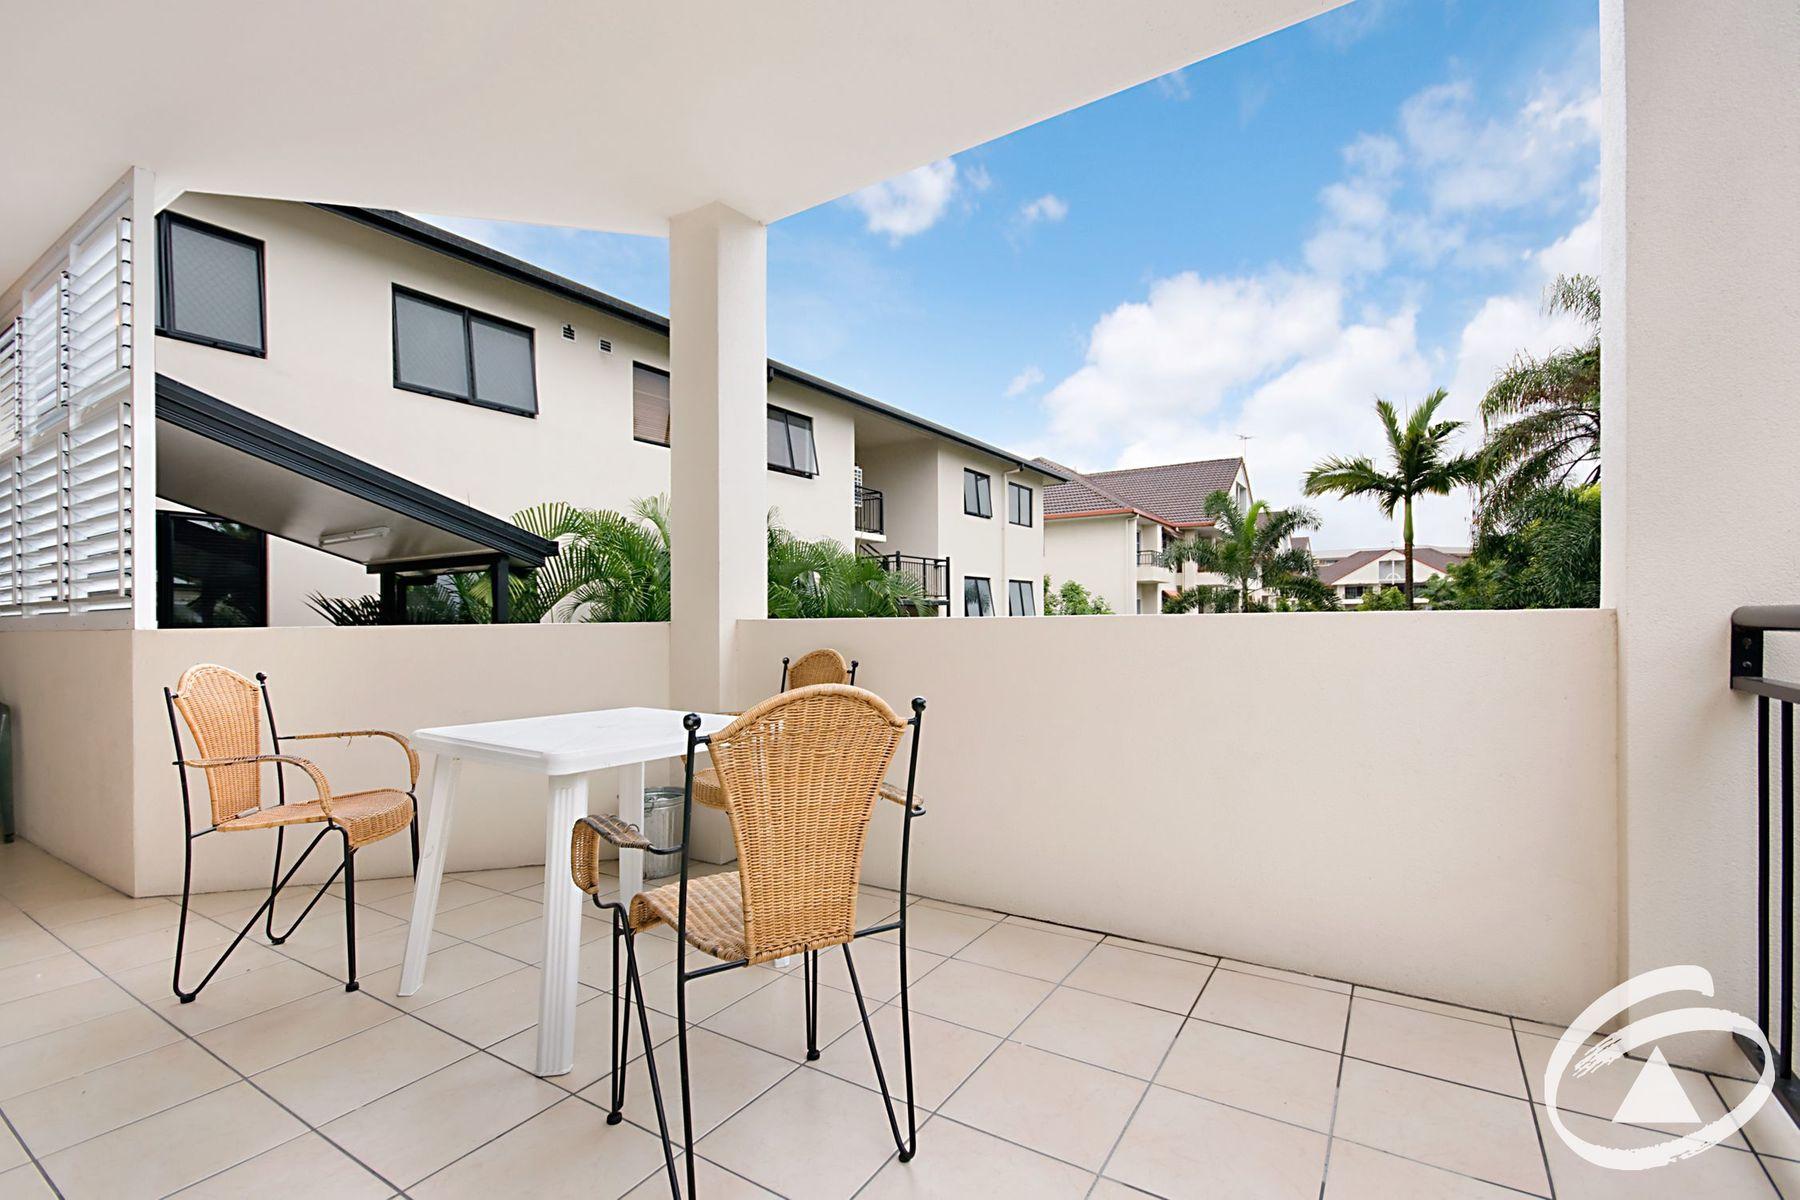 7/72 Digger Street, Cairns North, QLD 4870